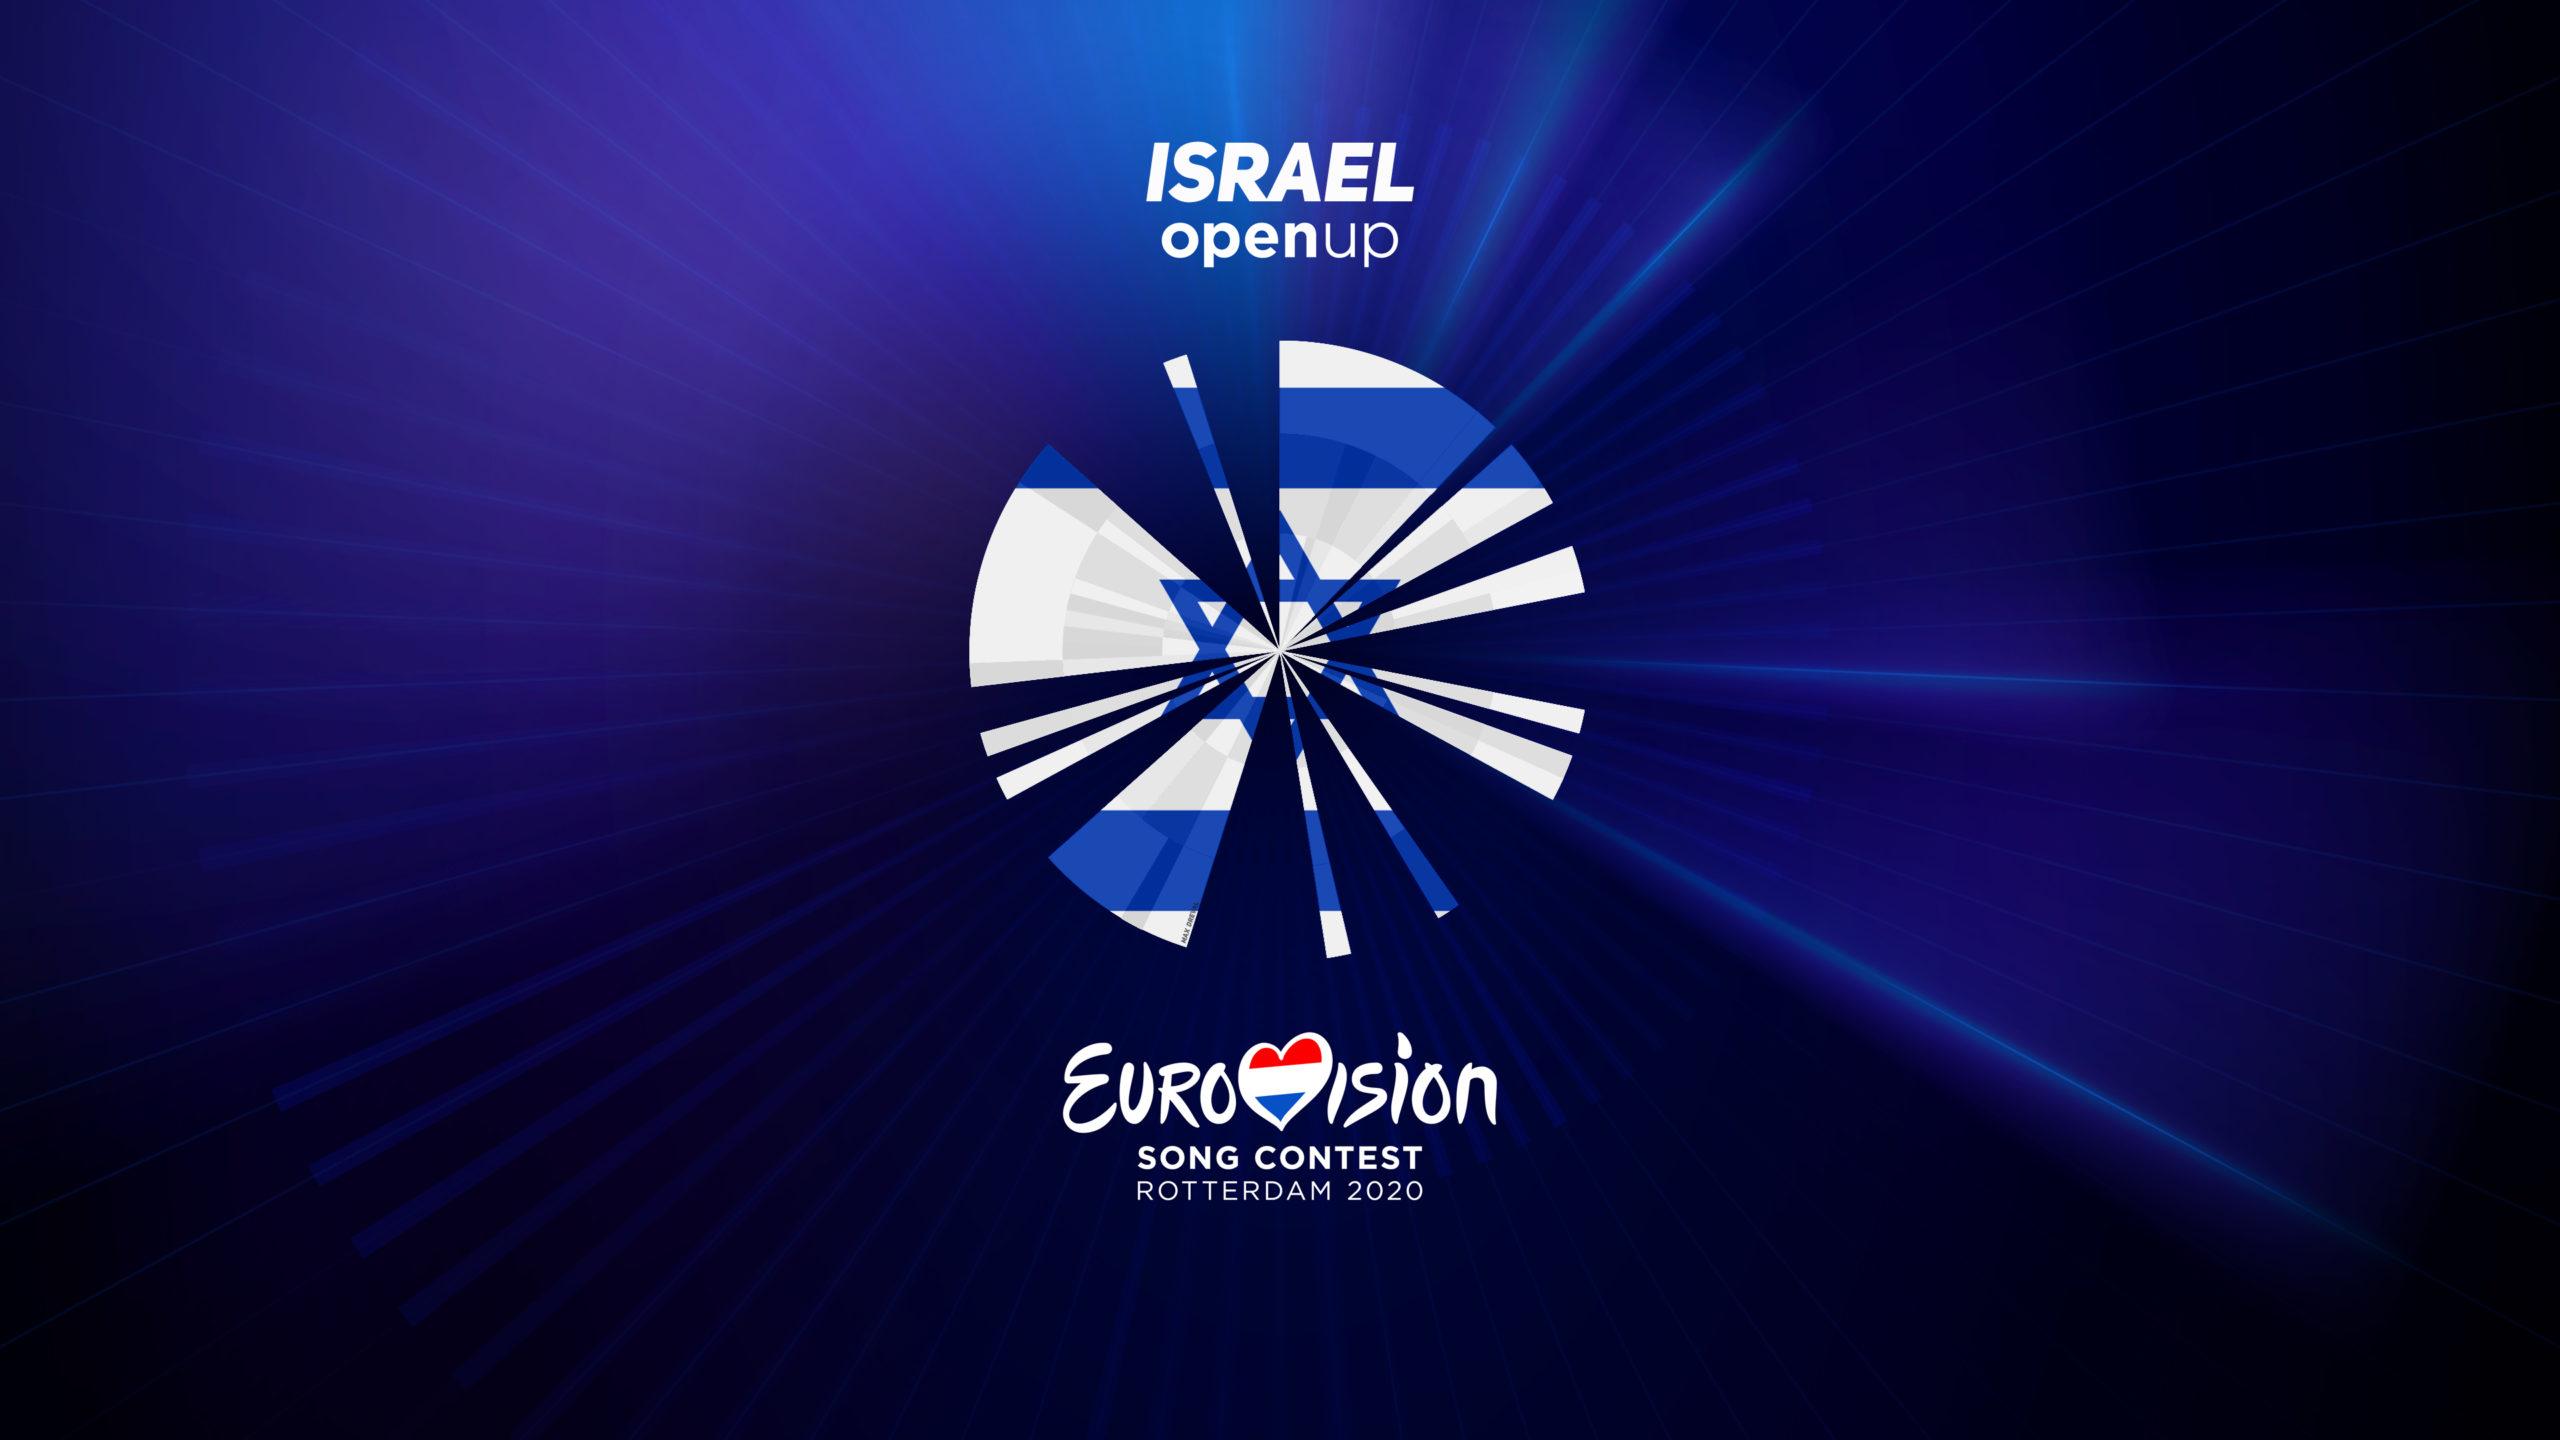 Israel-scaled.jpg